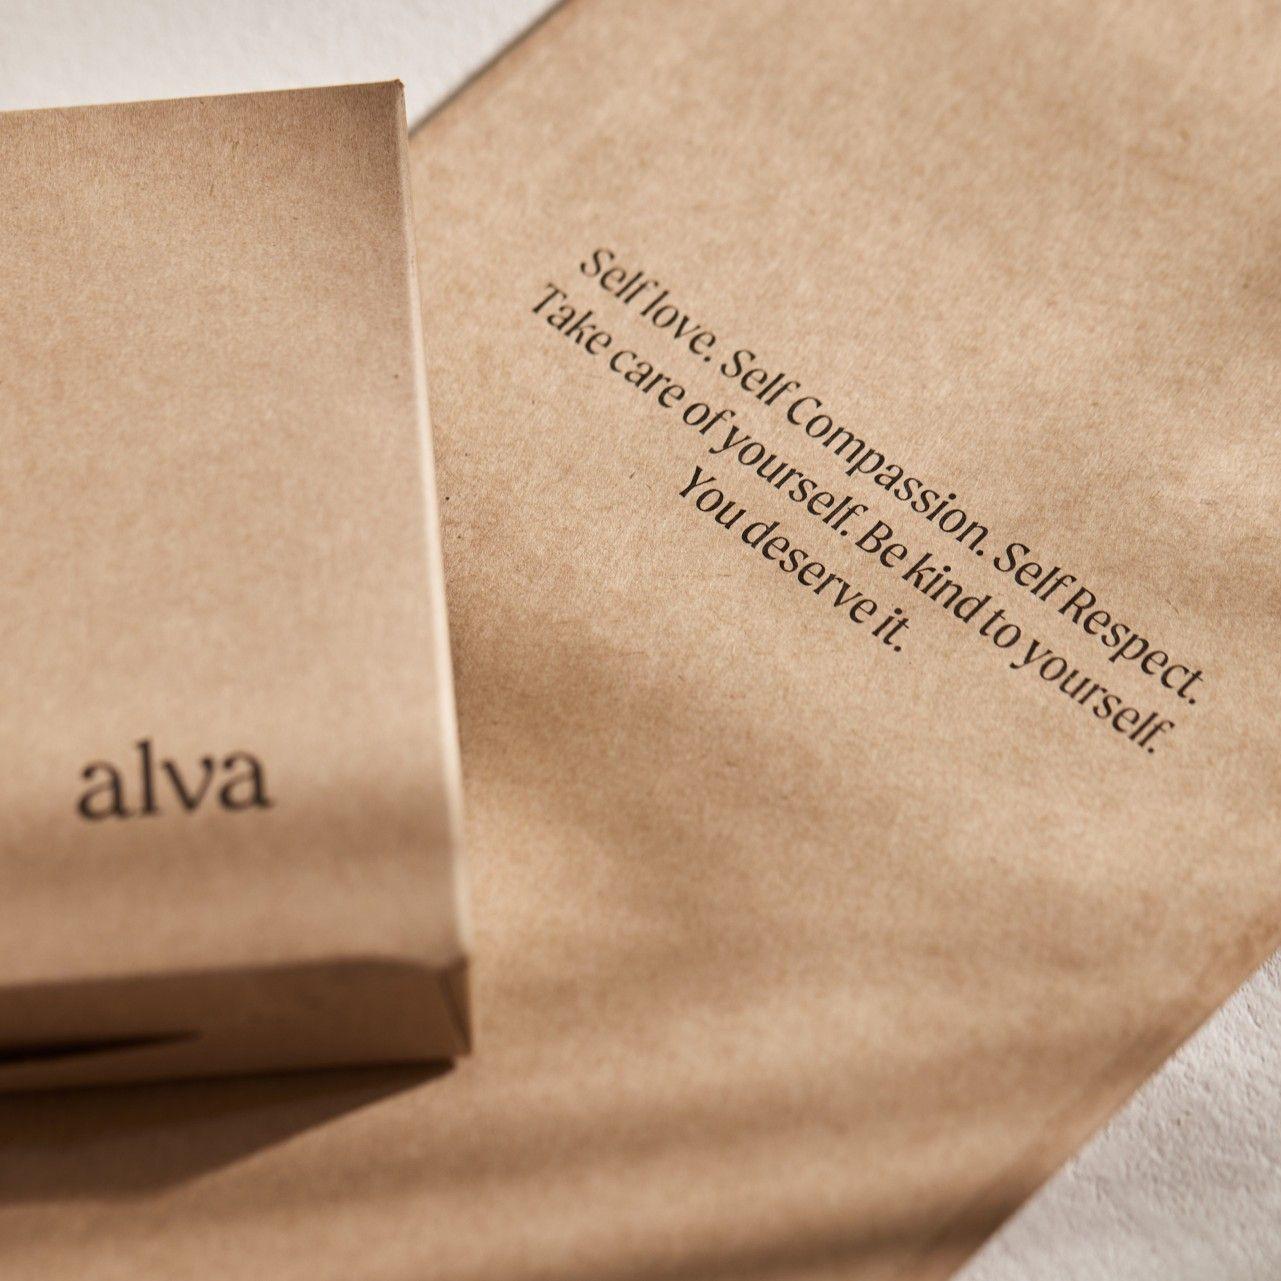 Alva packaging